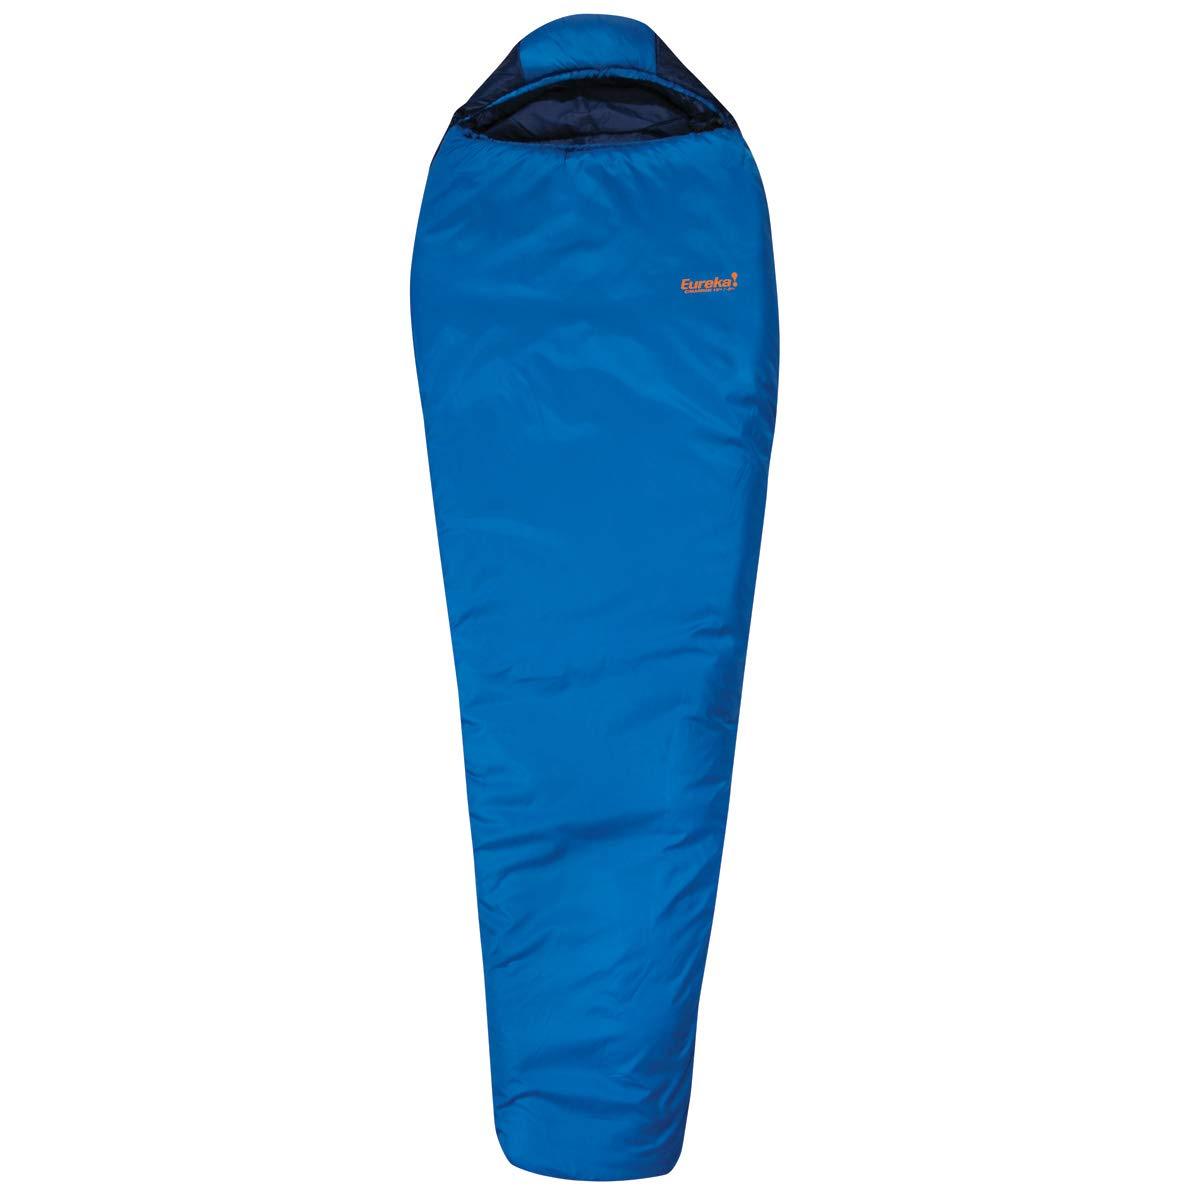 Eureka Cimarron 15-Degree, 3-Season Mummy Sleeping Bag, Regular Size, Blue 4 Pounds 1 Ounce